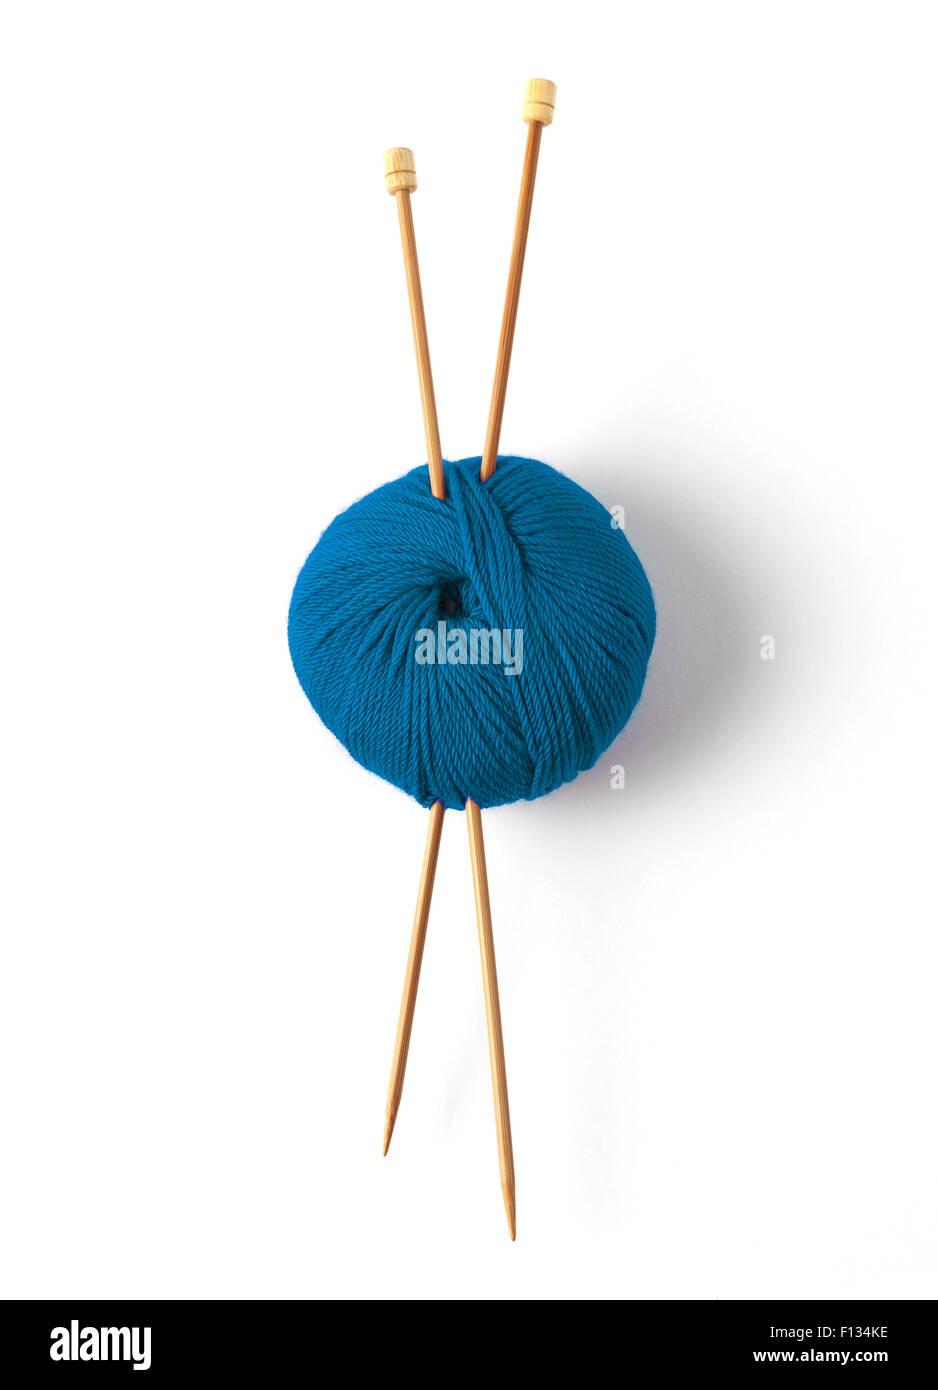 Knitting wool and needle - Stock Image